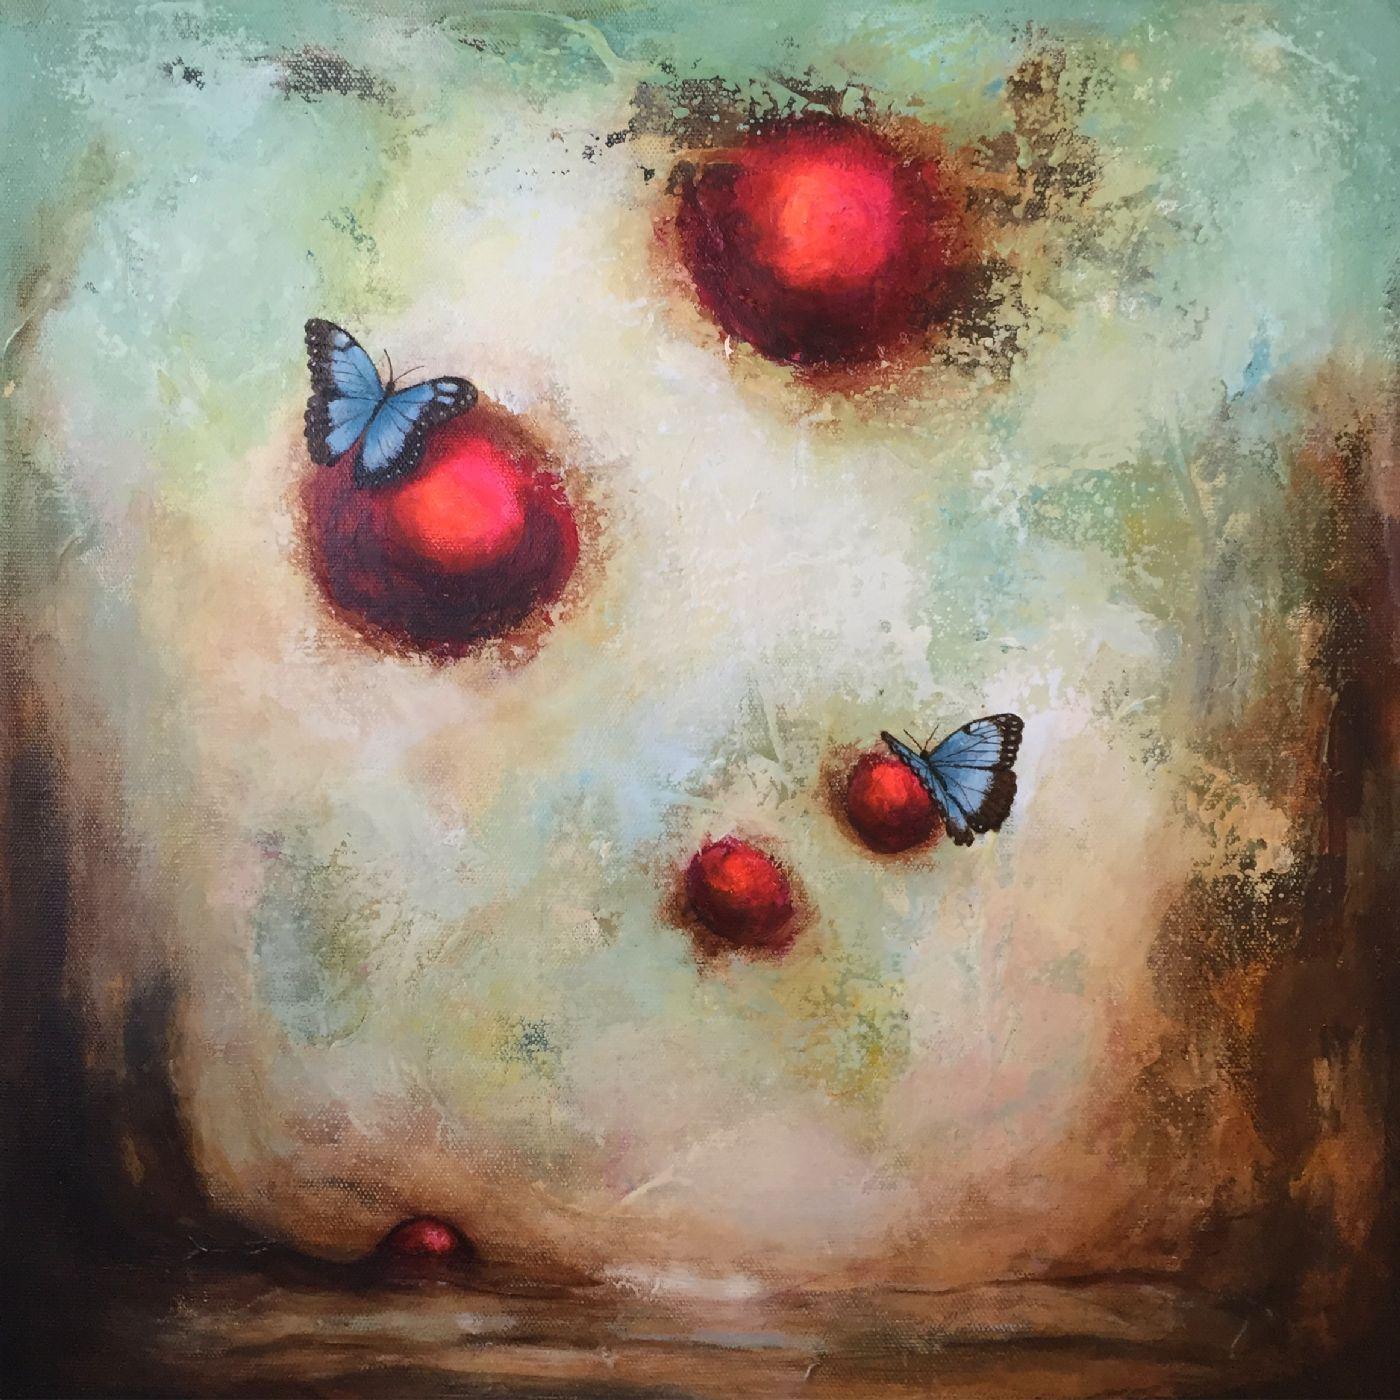 You give me butterflies - II | Maleri